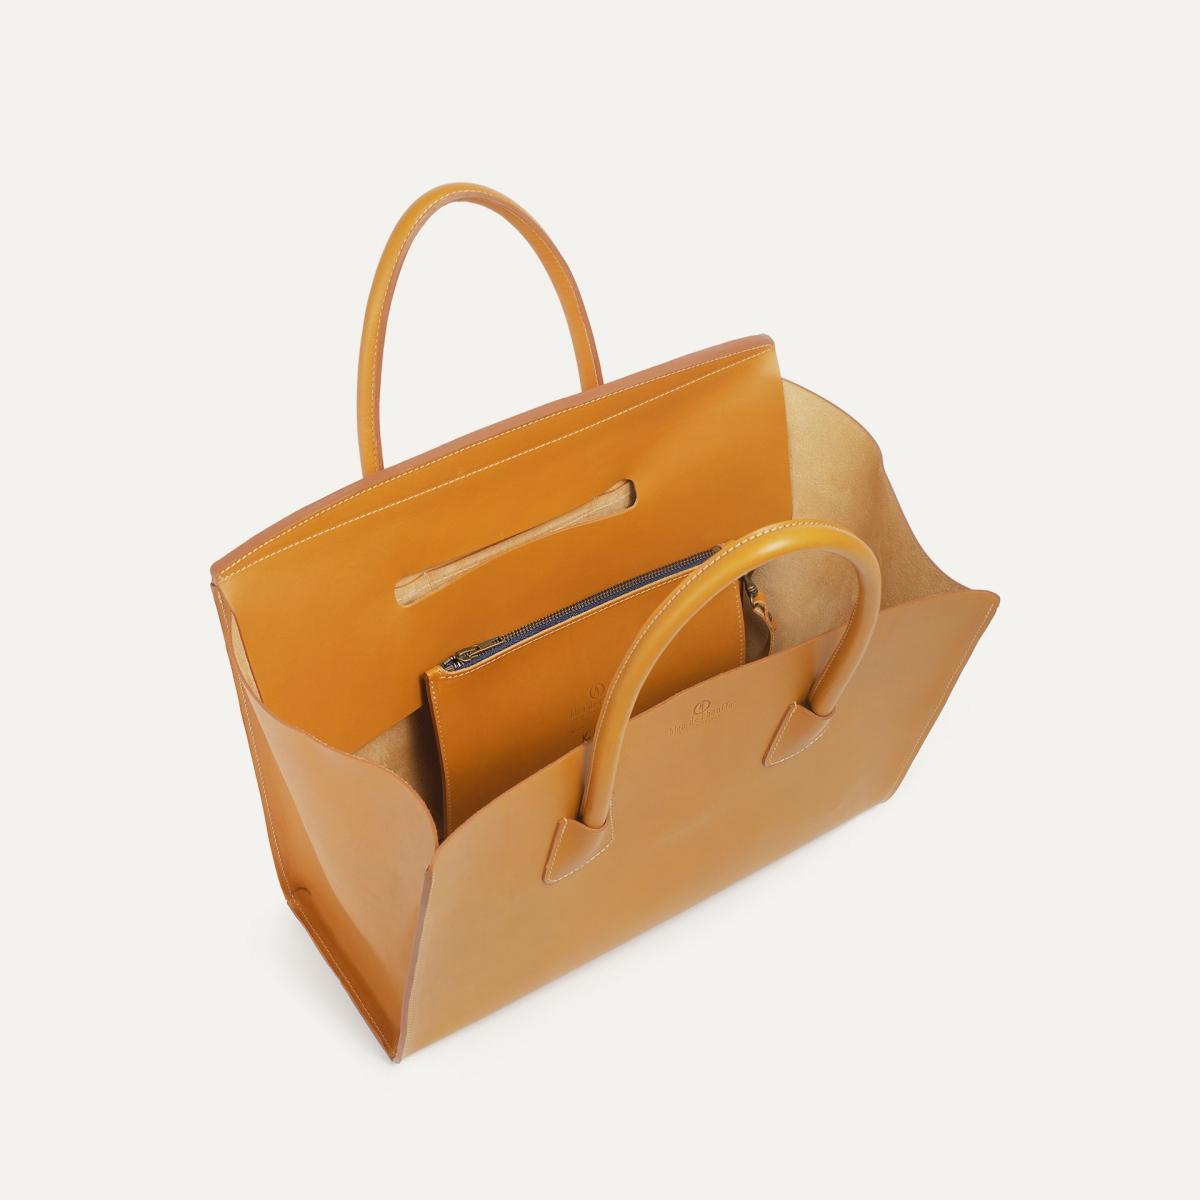 Origami L Tote - Honey (image n°5)